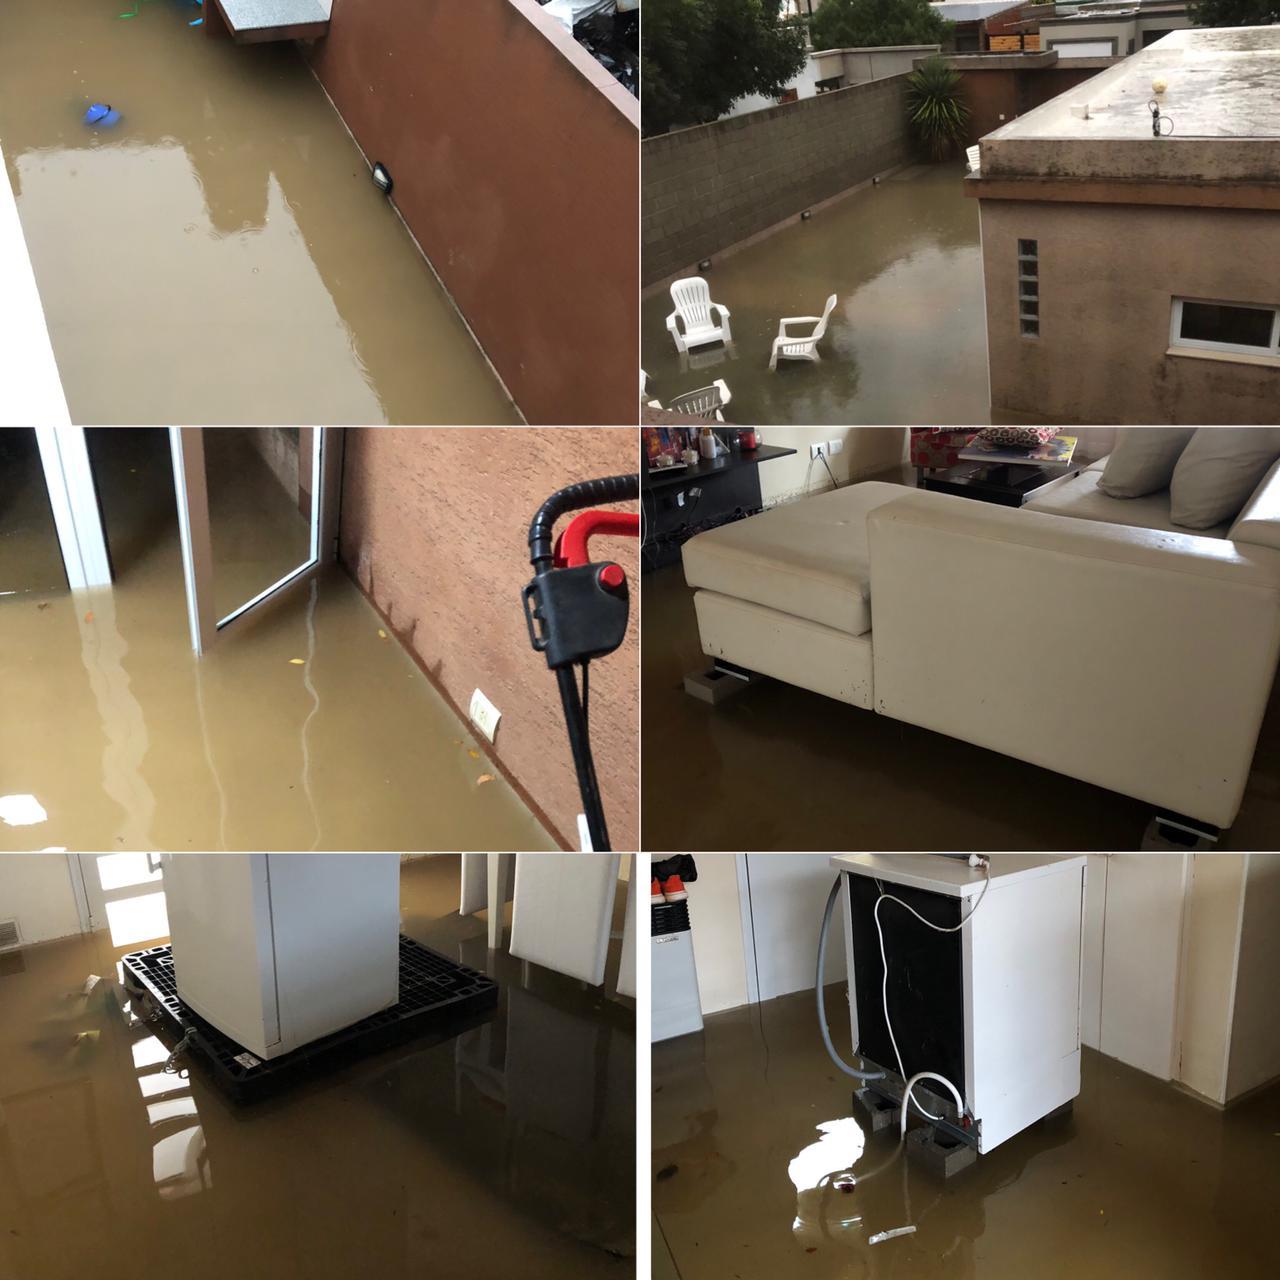 https://www.guiamedia.com.ar/una-inundacion-que-deja-miles-de-heridas/2021/